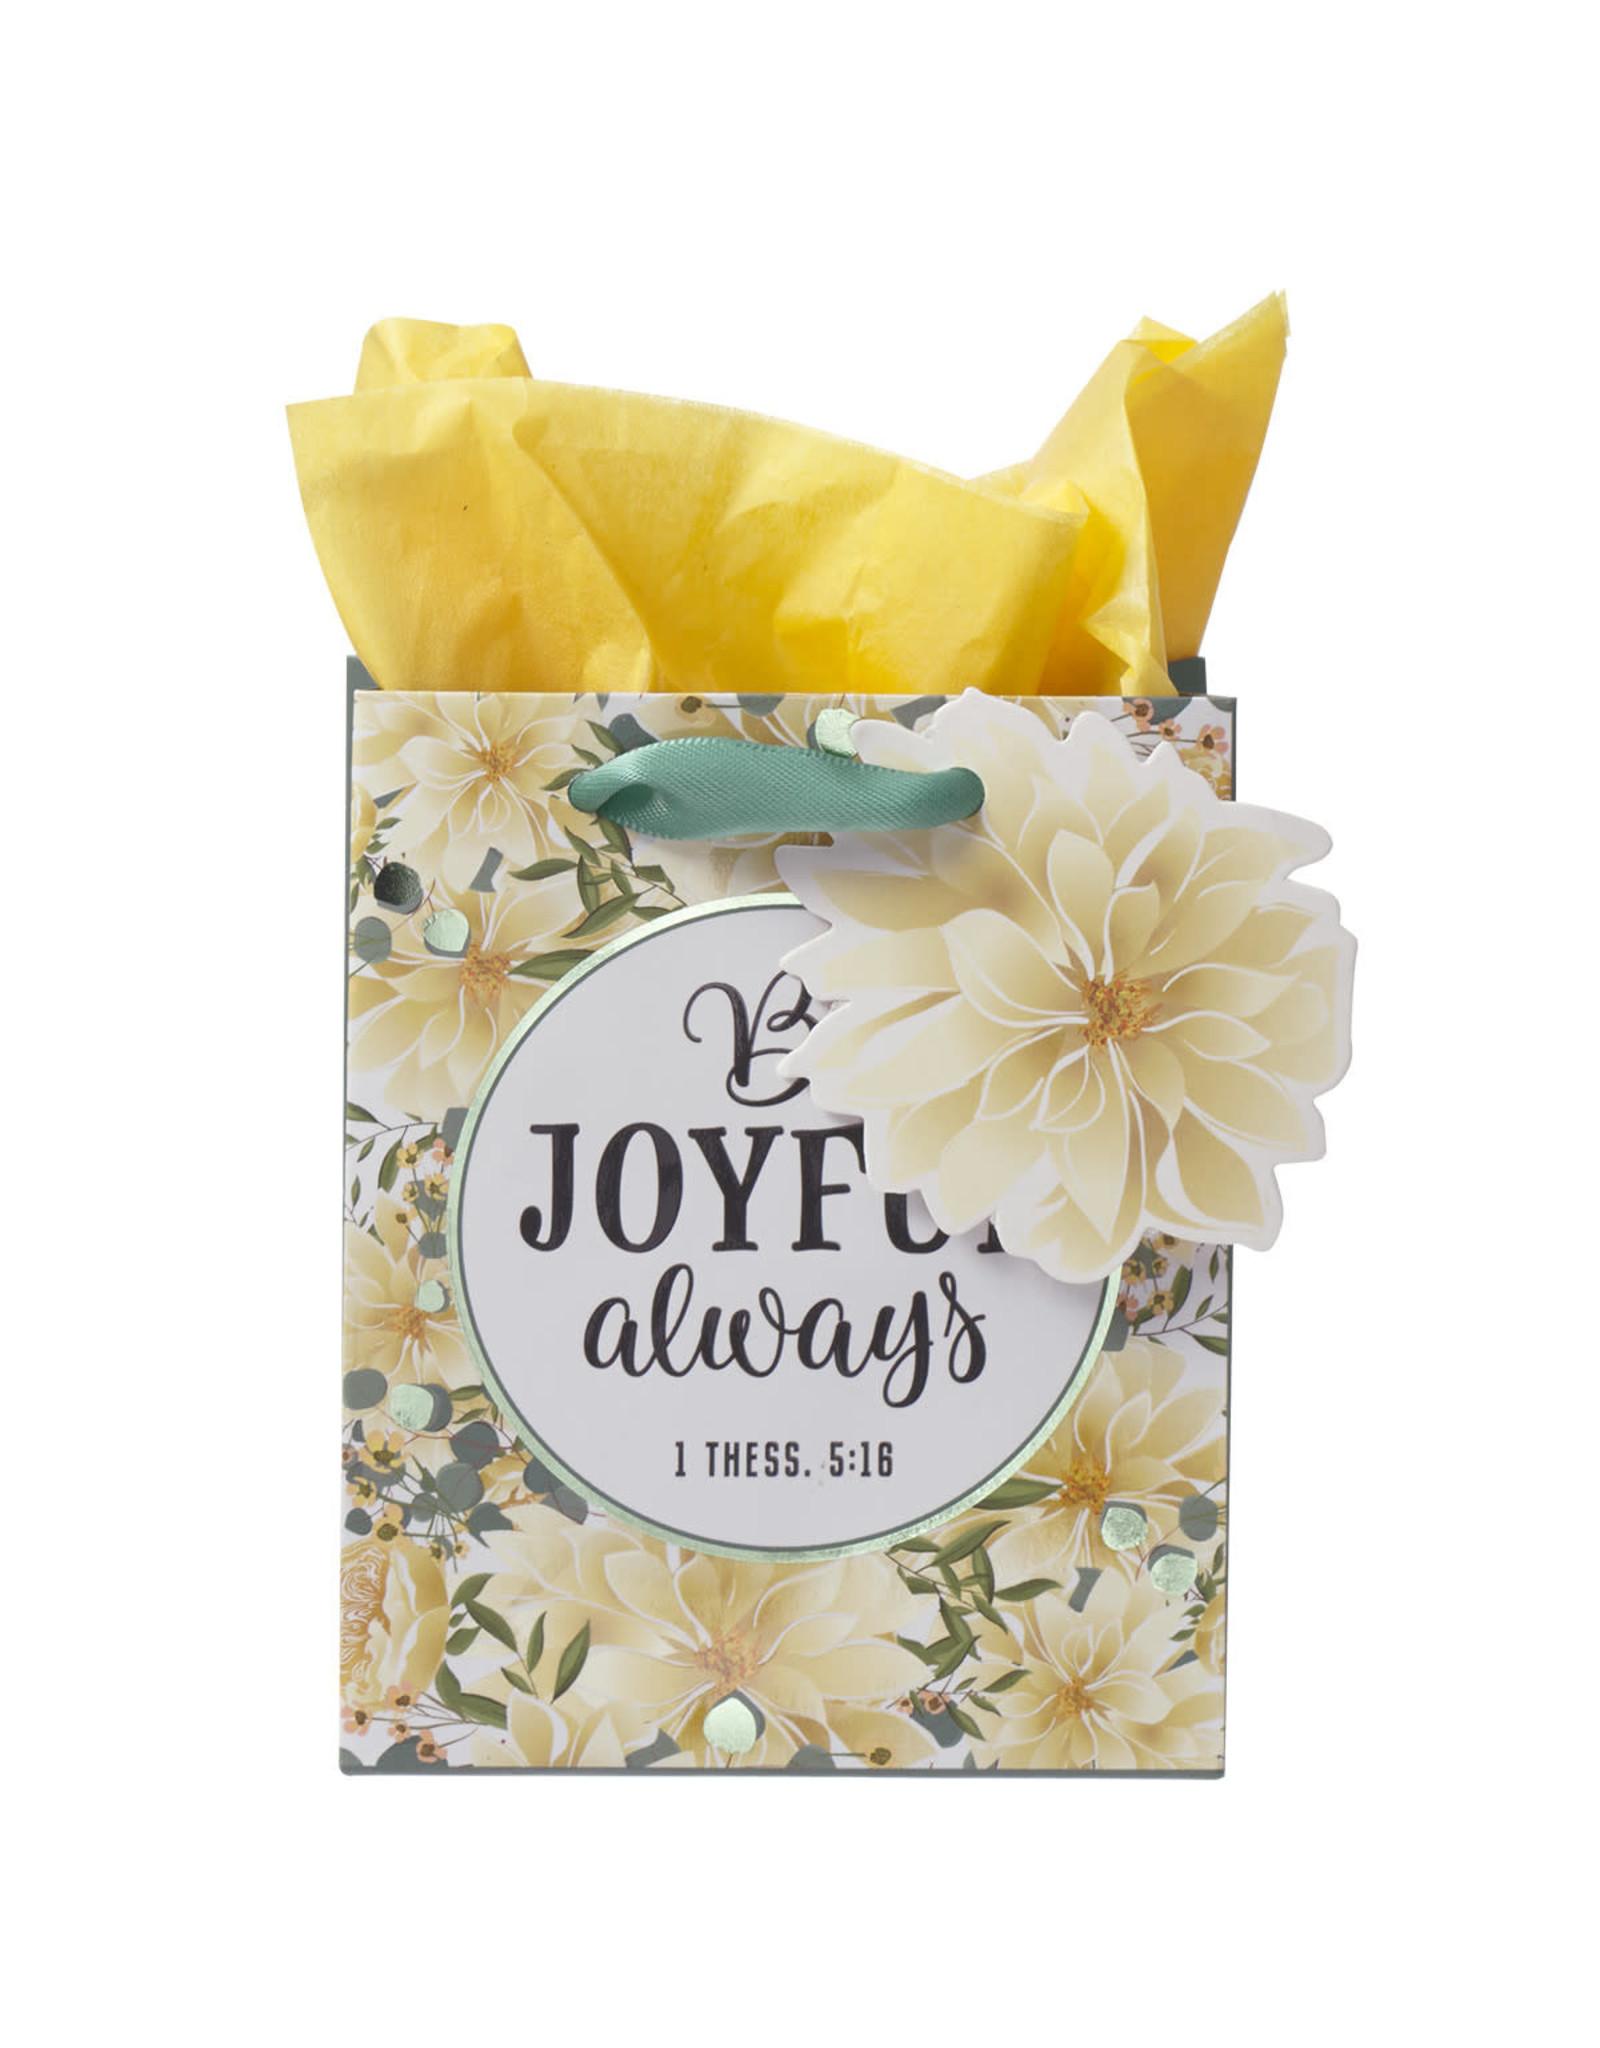 Be Joyful Always Extra Small Gift Bag – 1 Thessalonians 5:16